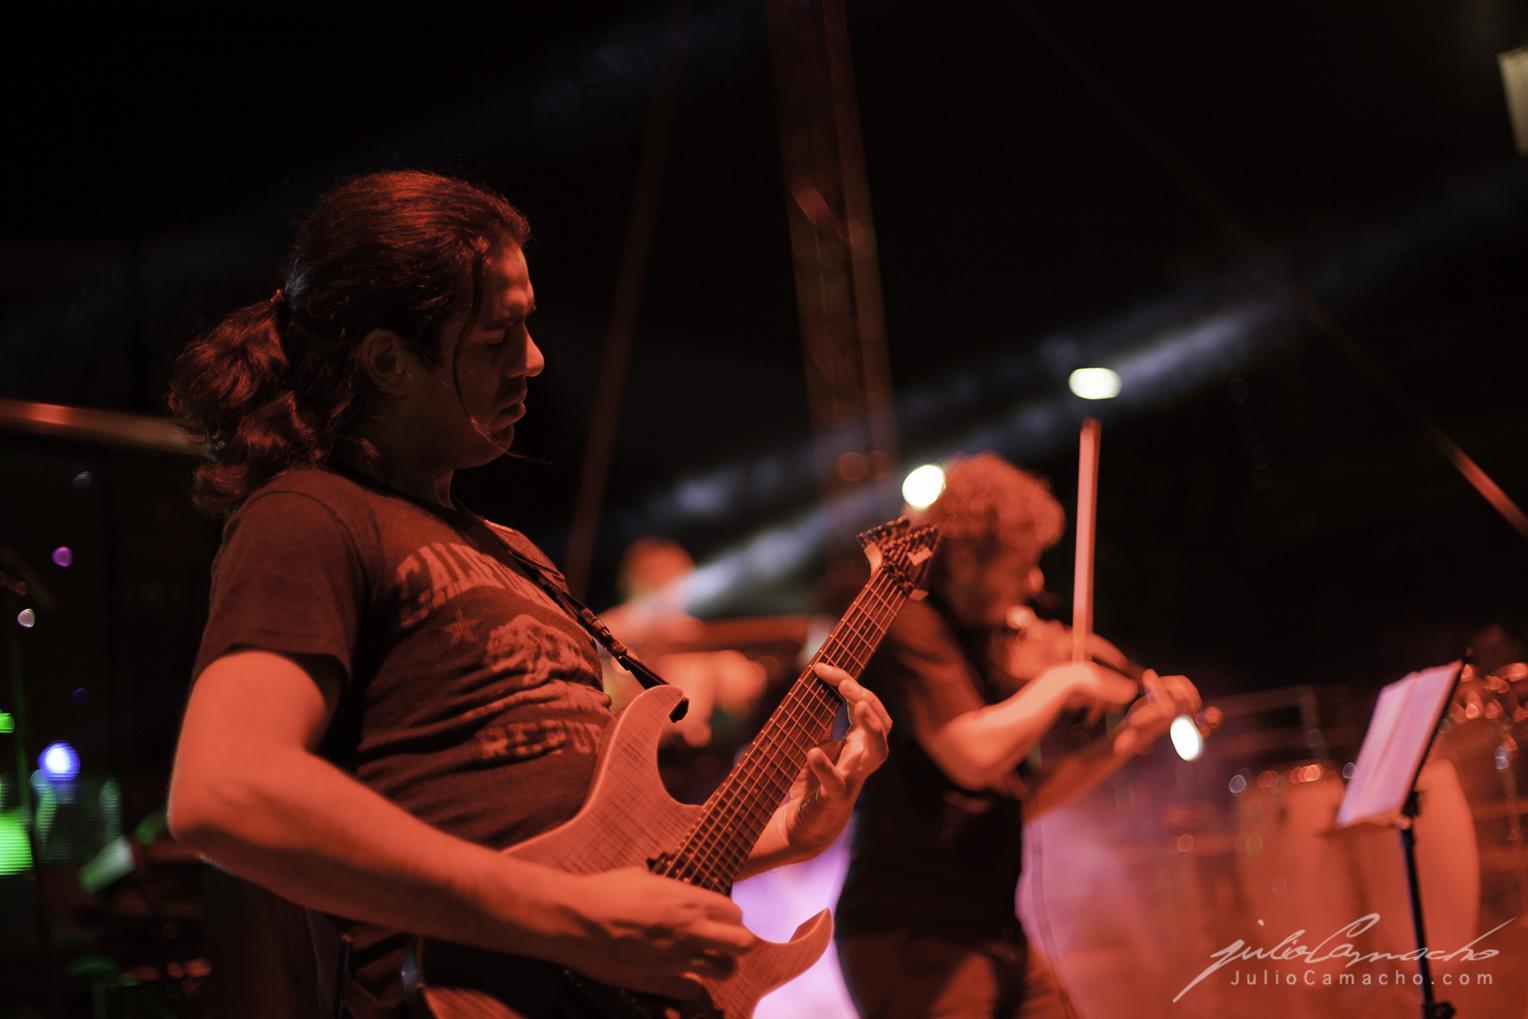 2014-10-30 31 CAST TOUR Ensenada y Tijuana - 1554 - www.Juli (Copy).jpg